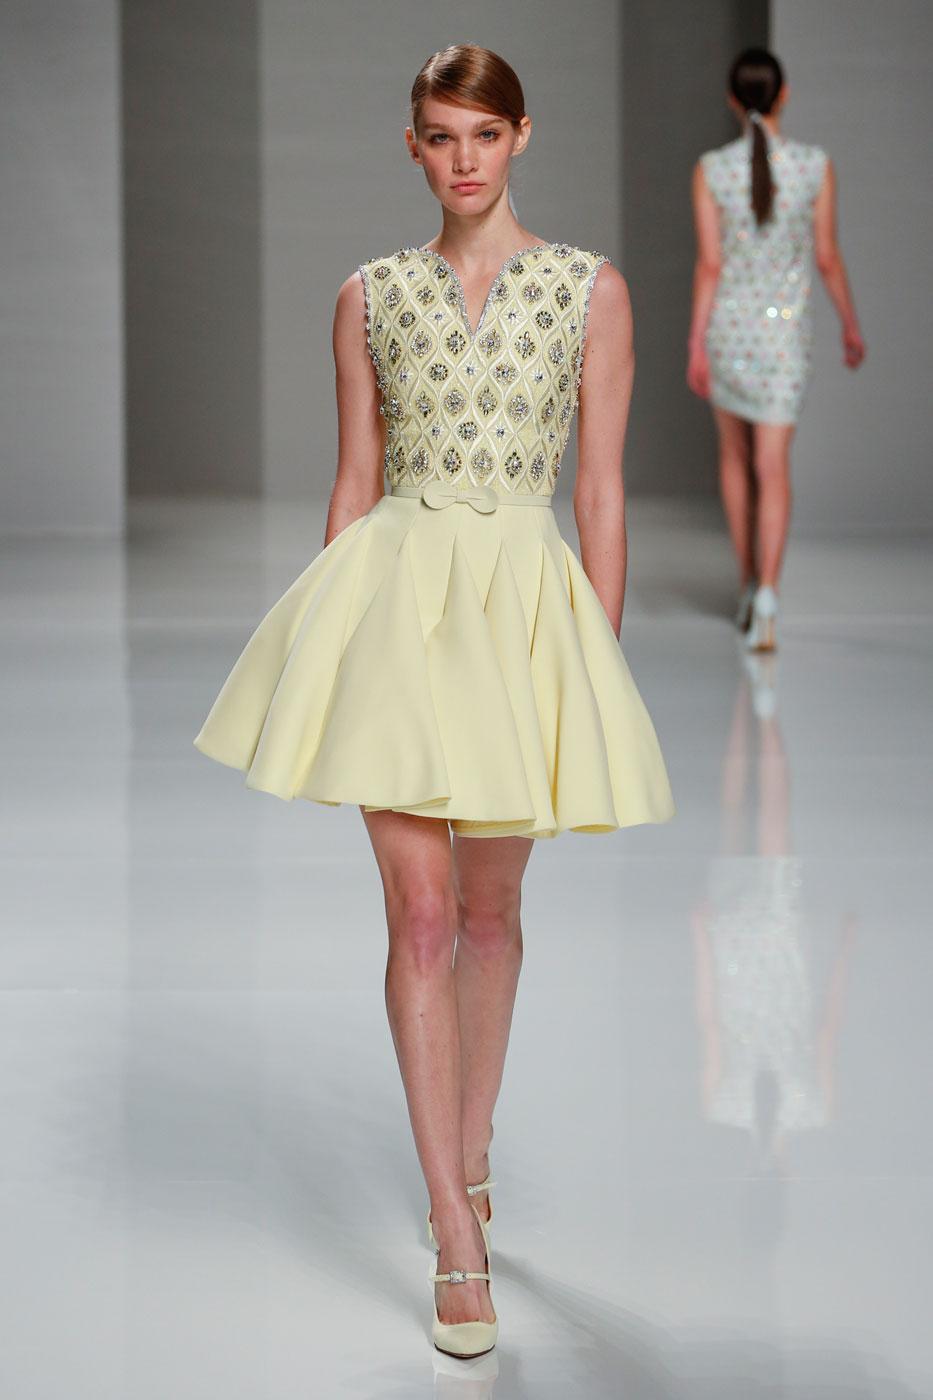 Georges-Hobeika-fashion-runway-show-haute-couture-paris-spring-2015-the-impression-17